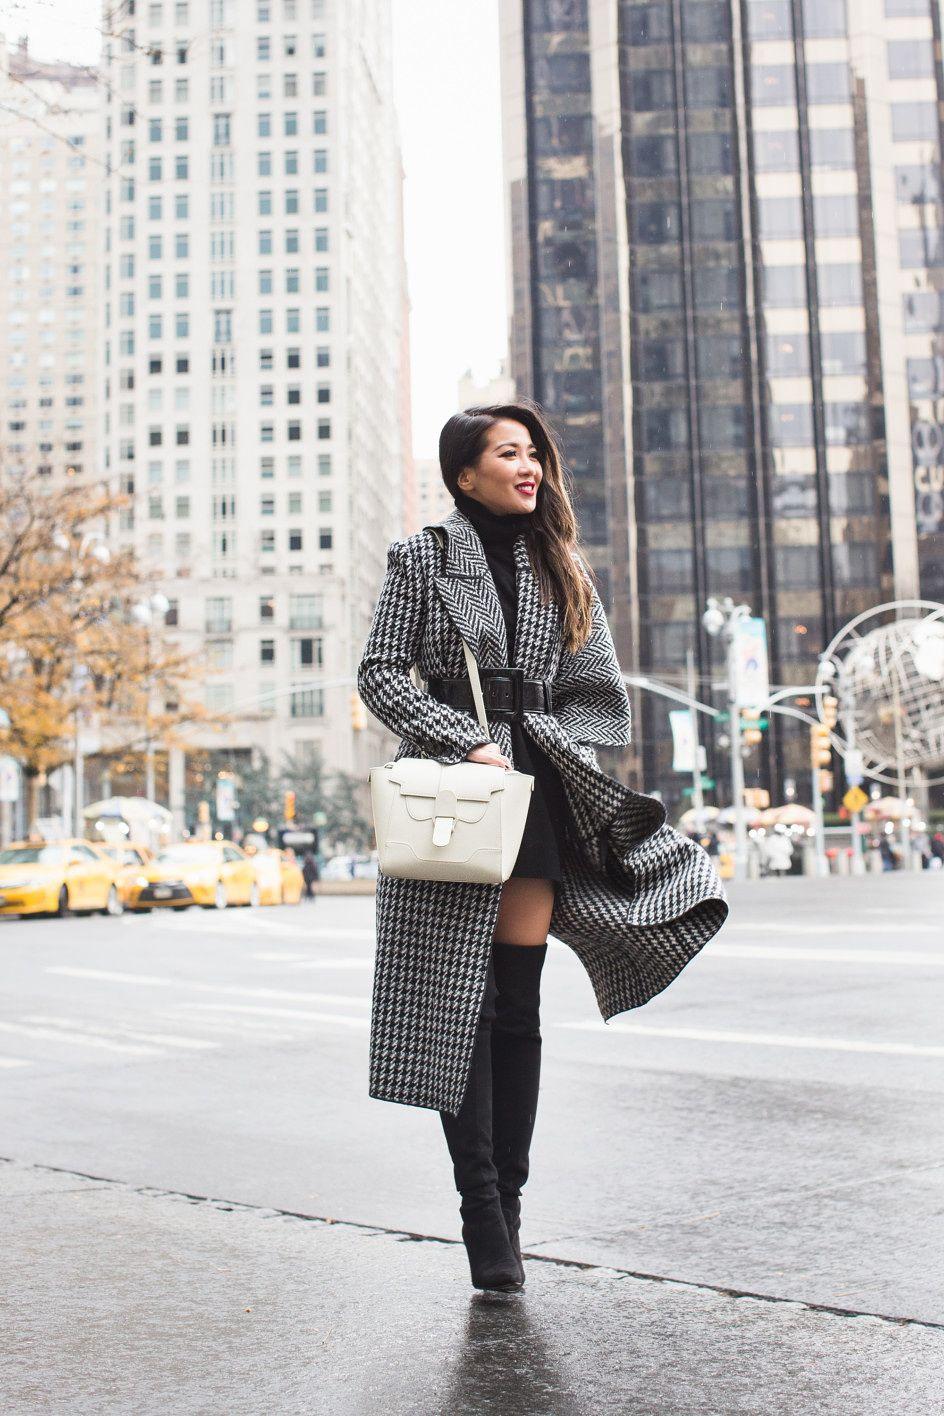 Winter Classics    Plaid coat   White bag - Wendy s LookbookWendy s Lookbook a6a2b7ef55